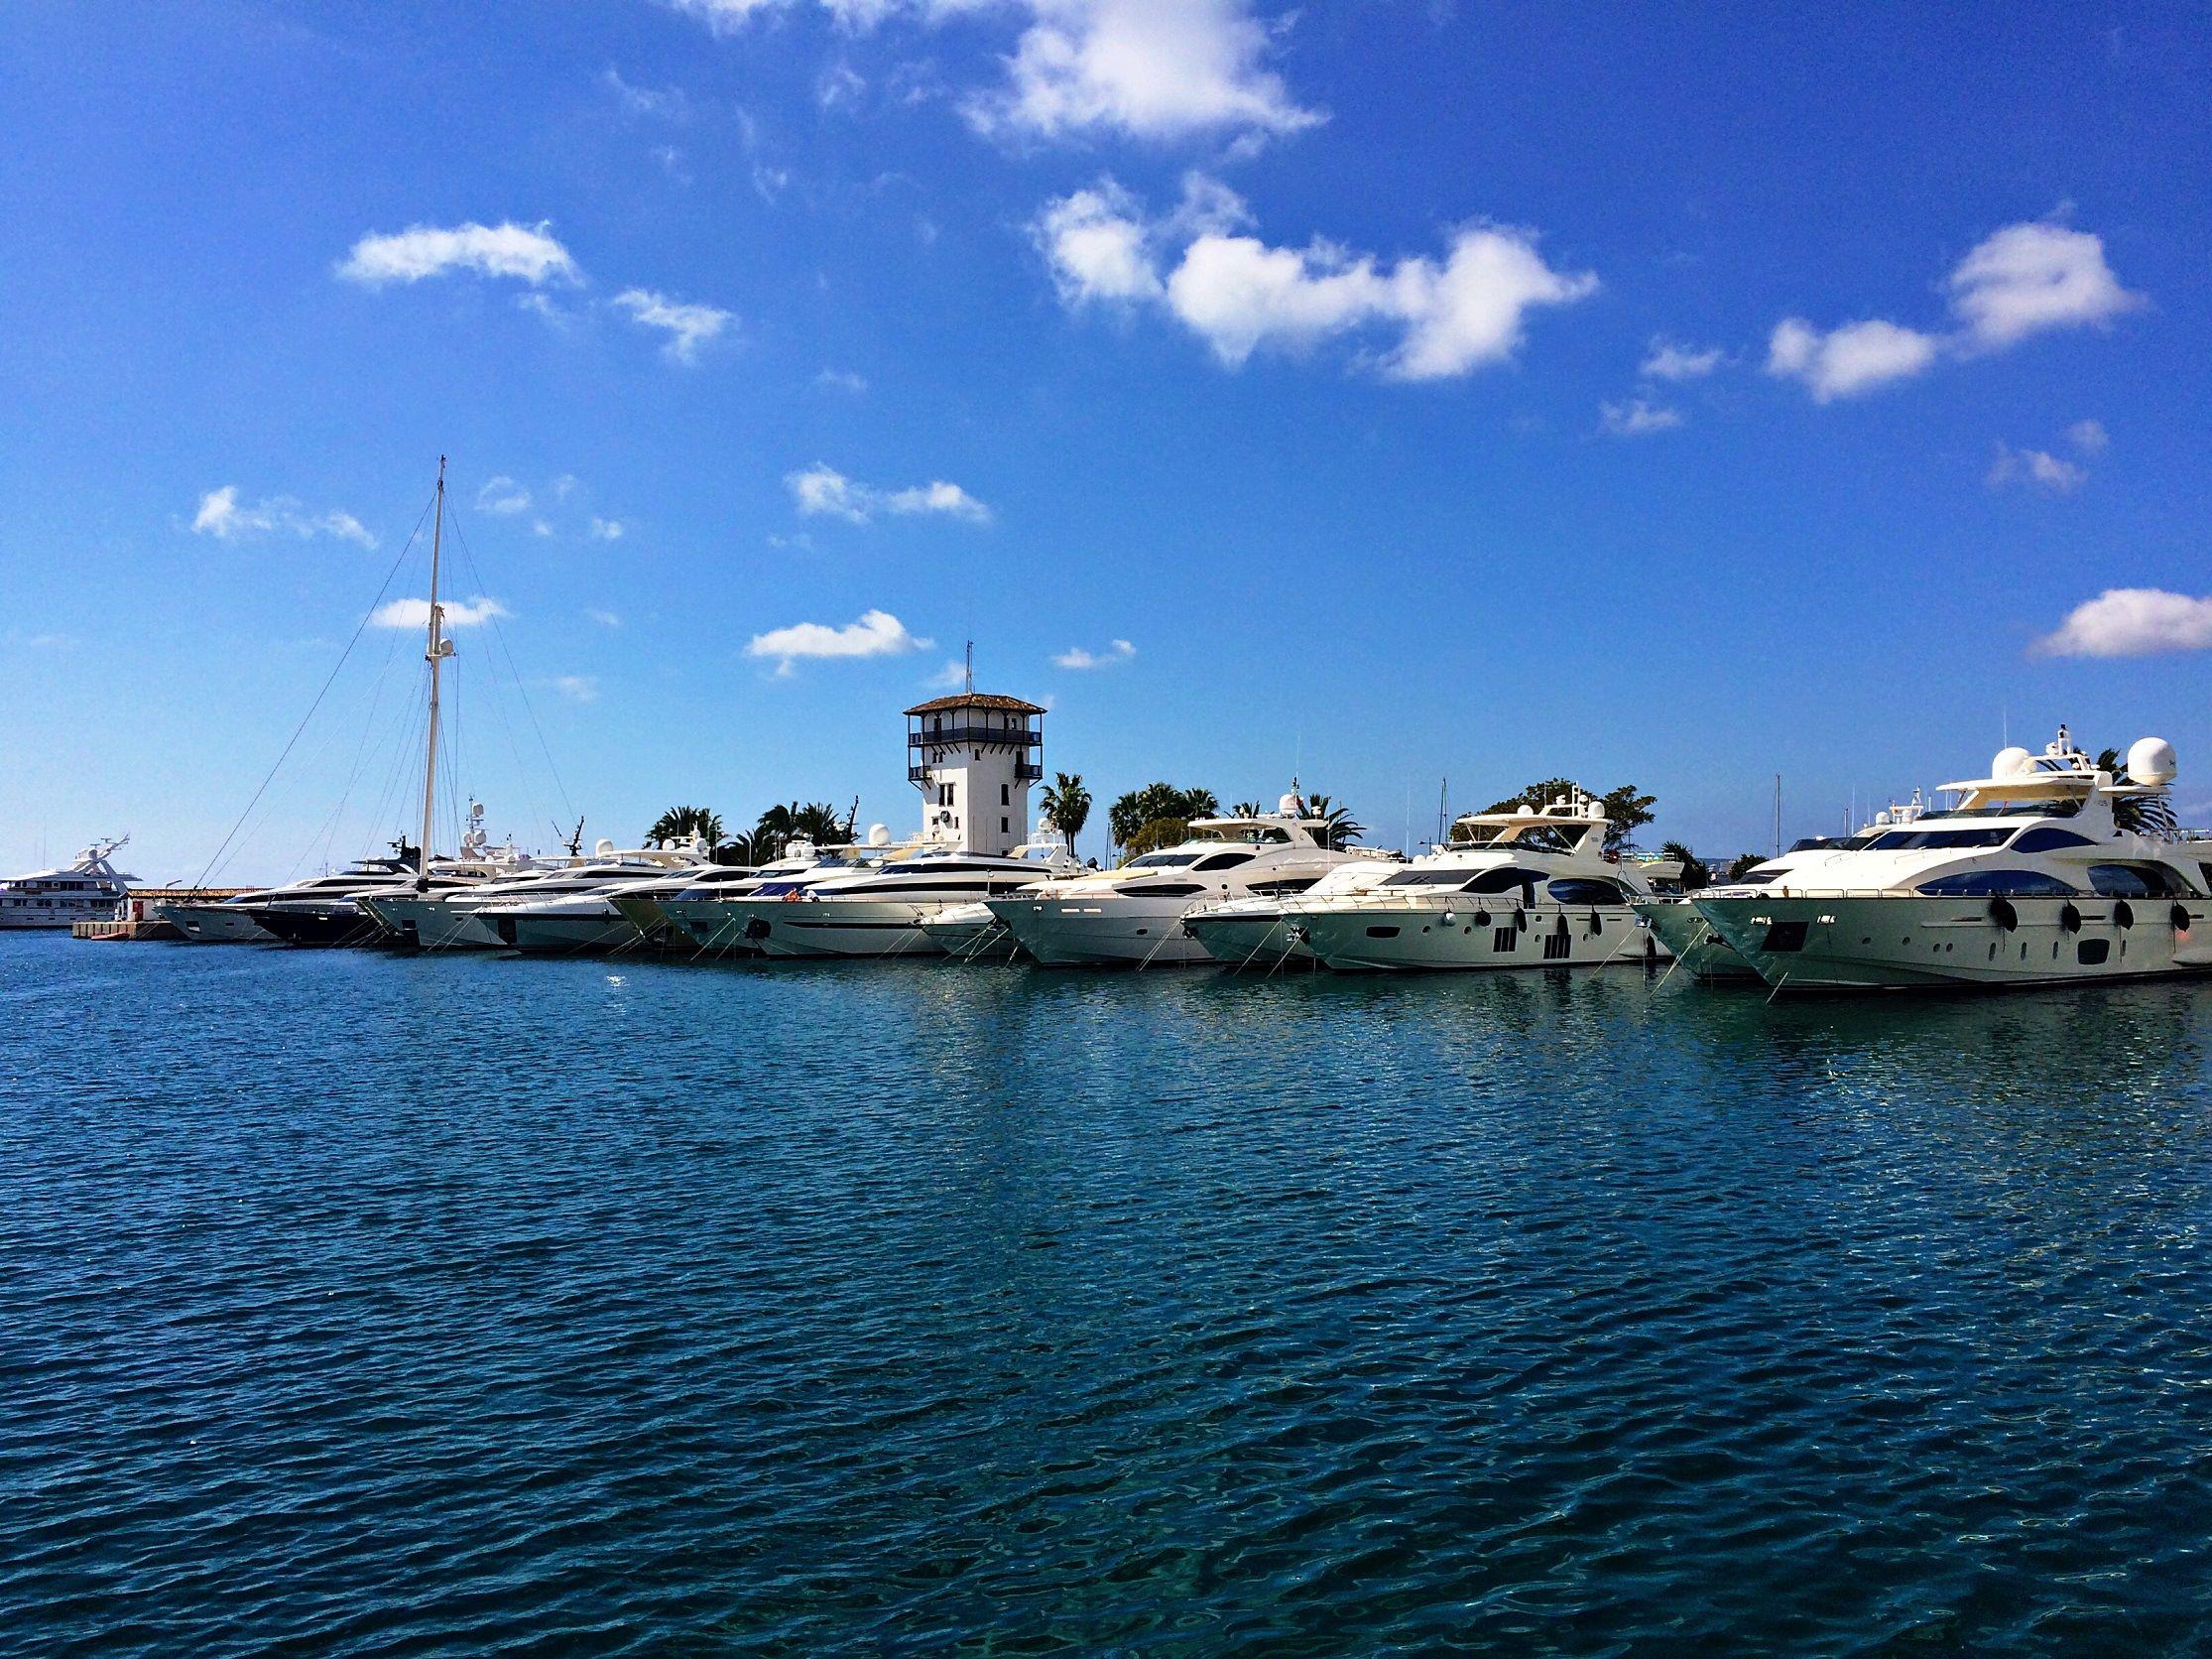 Mein perfektes Mallorca Wochenende staedtereisen sonne land und leute mallorca familie europa  tui berlin mallorca marina portals nous